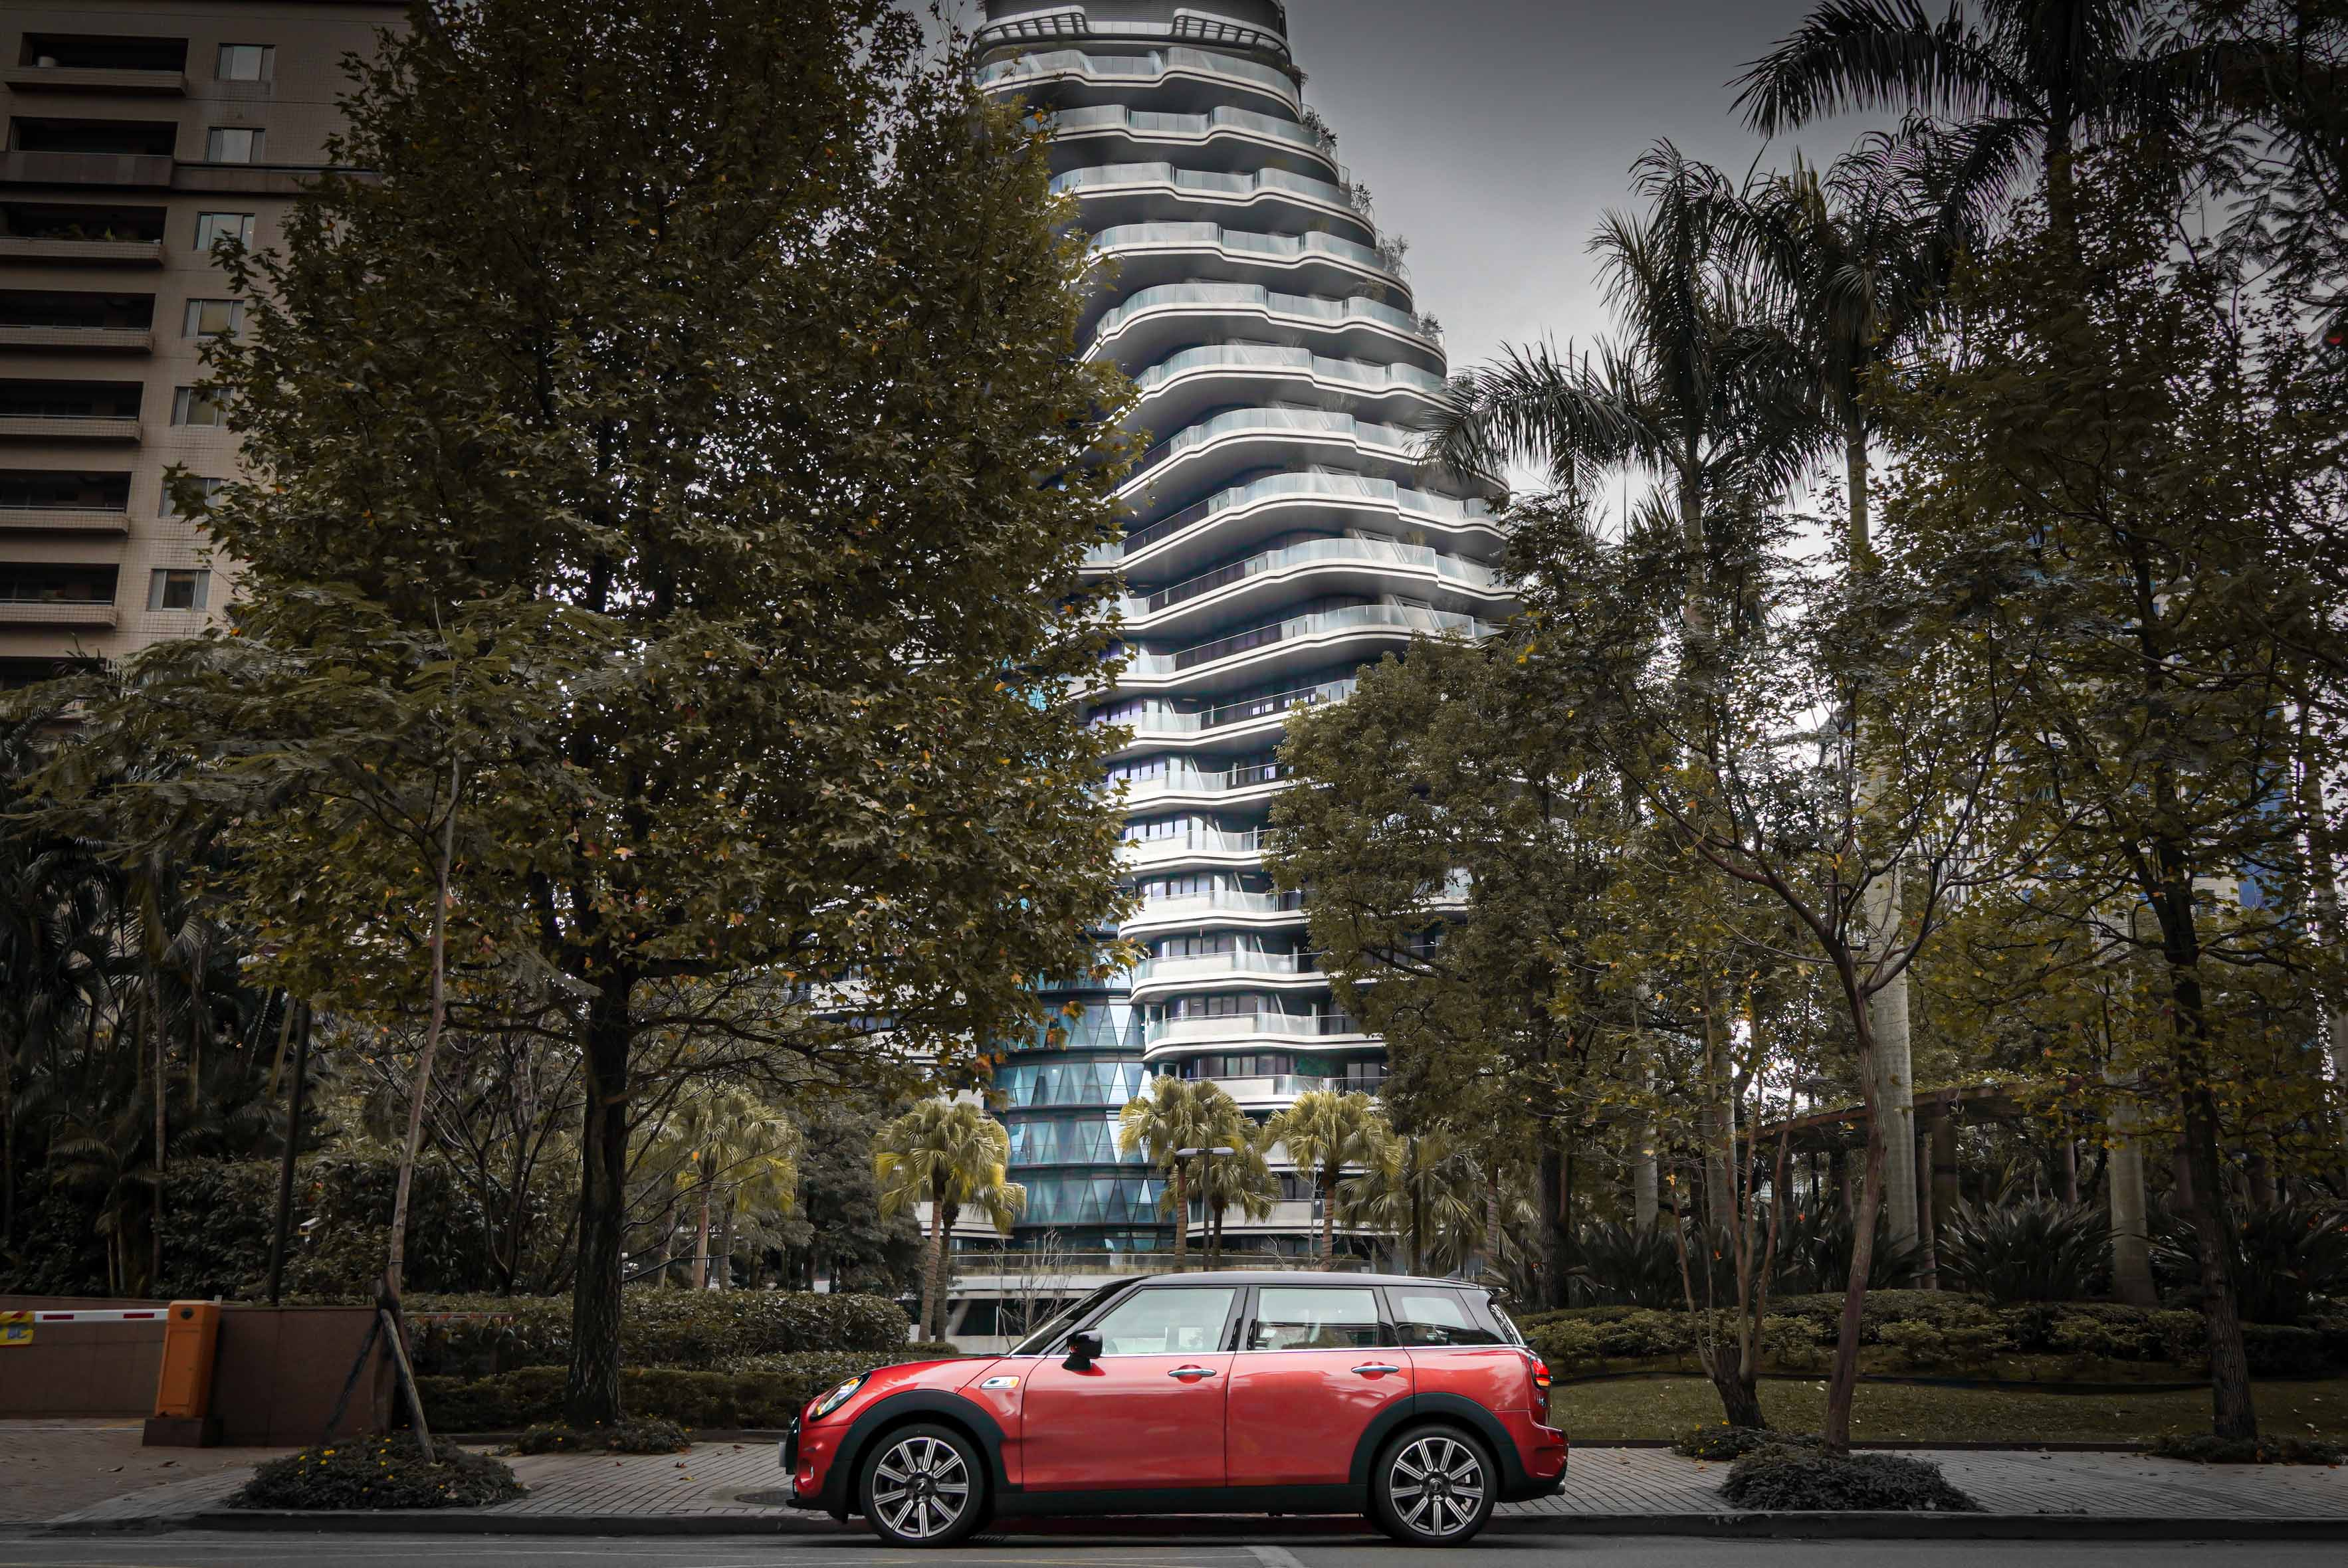 Mini Clubman 以三車型販售,Cooper、Cooper S、JCW Clubman ALL4,起跳價分別為 163 萬、185 萬、212 萬元。